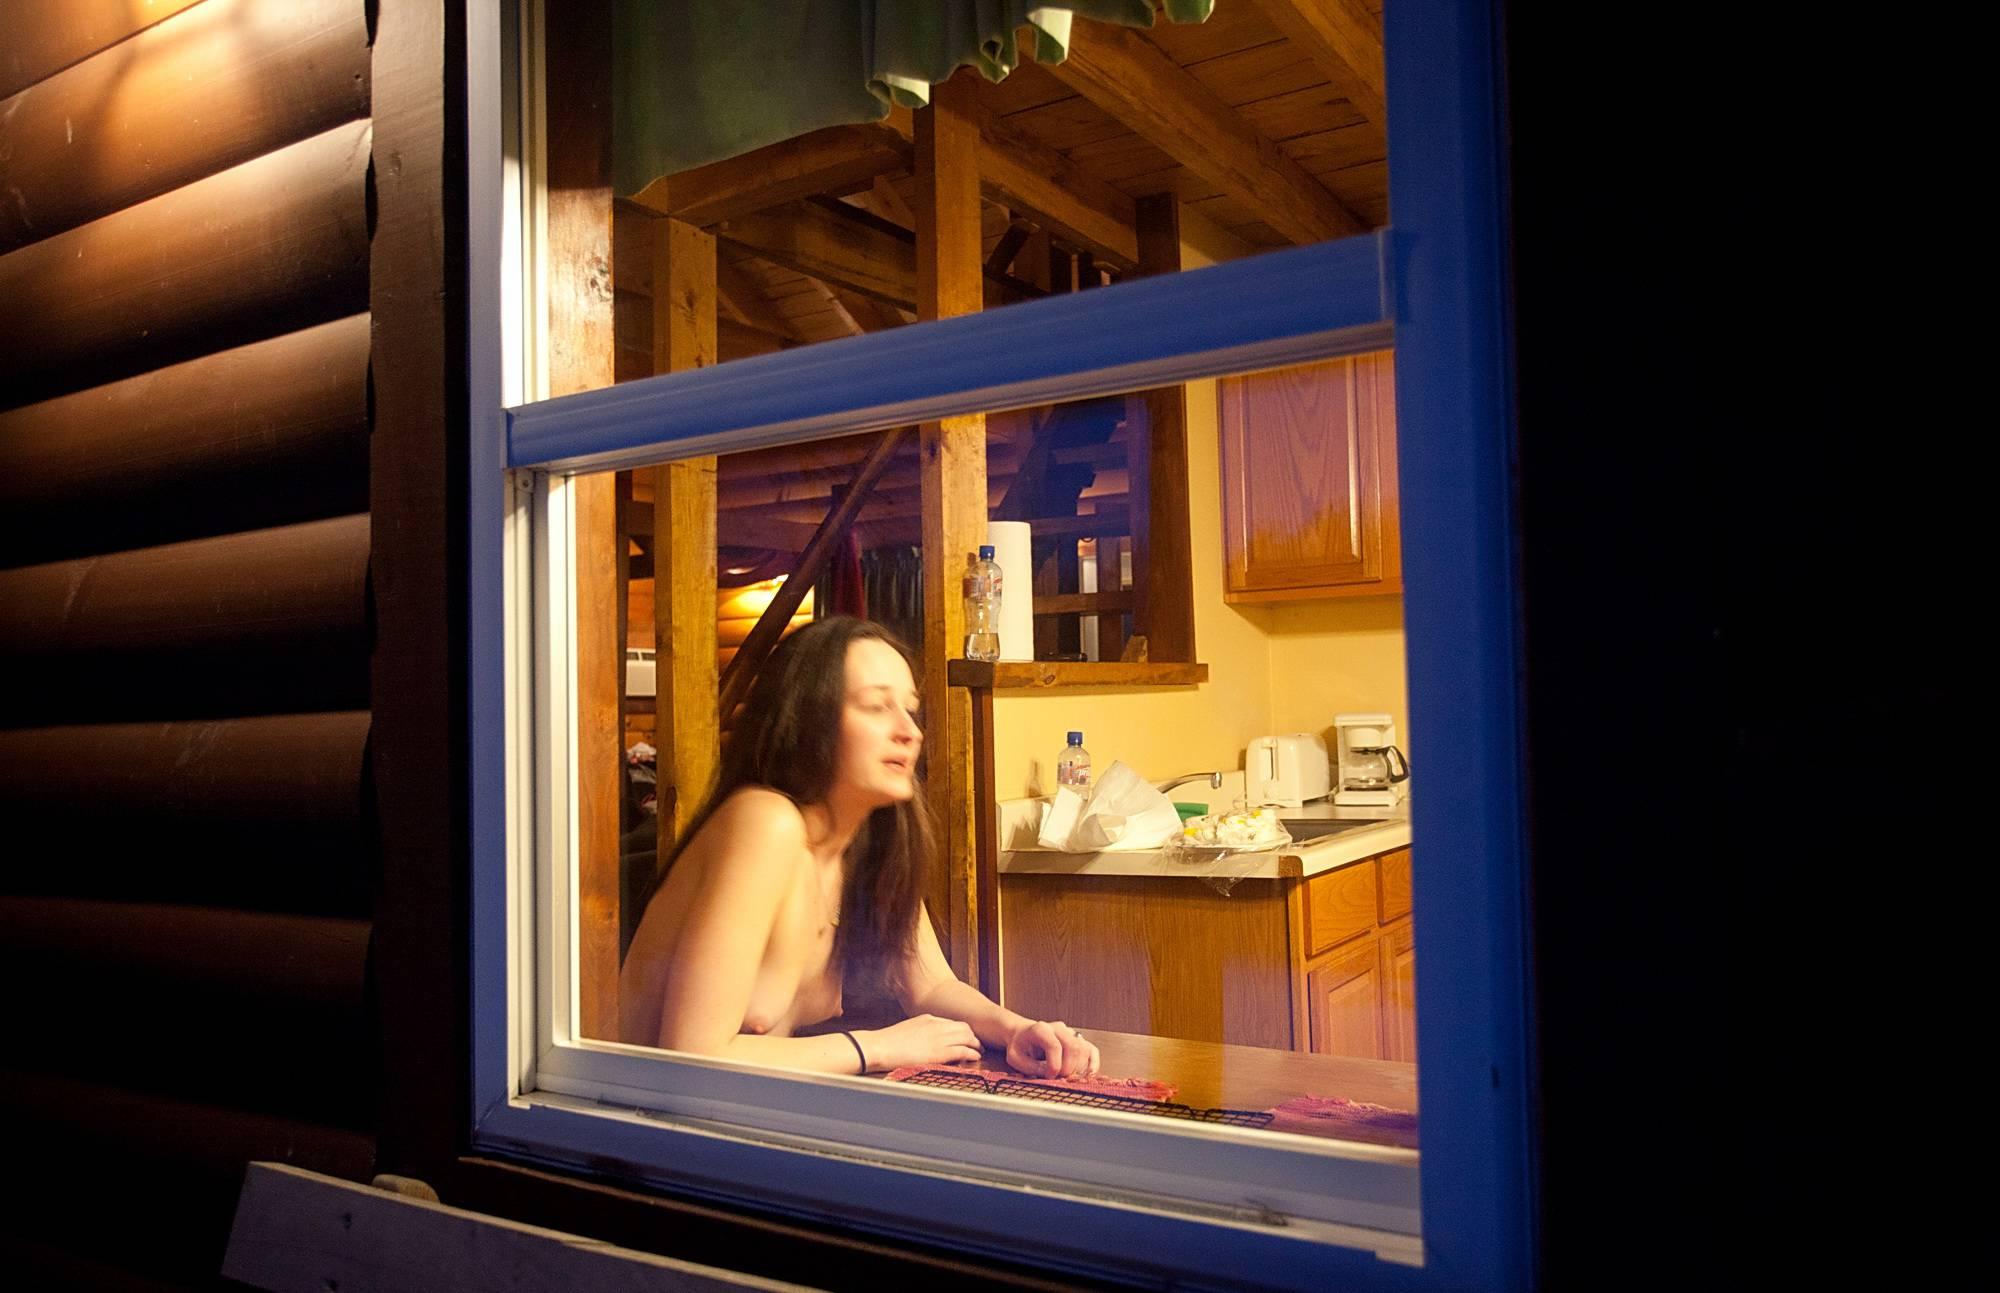 Nudist Photos Picture Perfect Window - 2